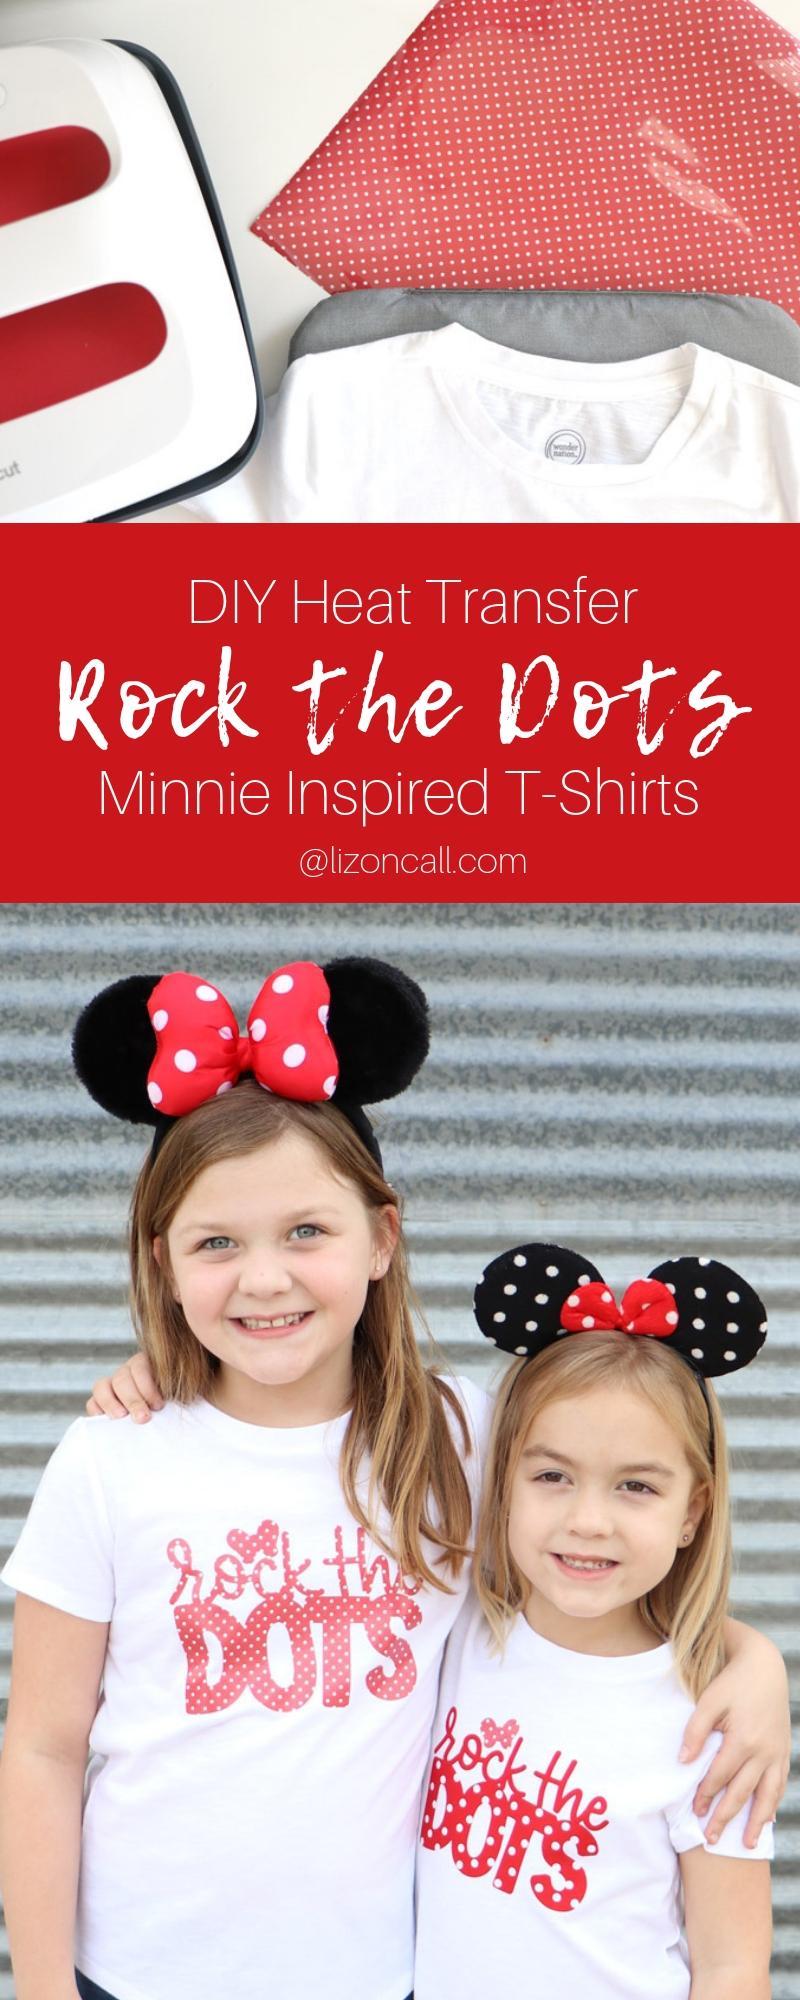 Show your love of polka dots and the original polka dot princess, with this Disney inspired DIY Minnie Rock The Dots Shirt. Get the free cut file. #rockthedots #disneydiy